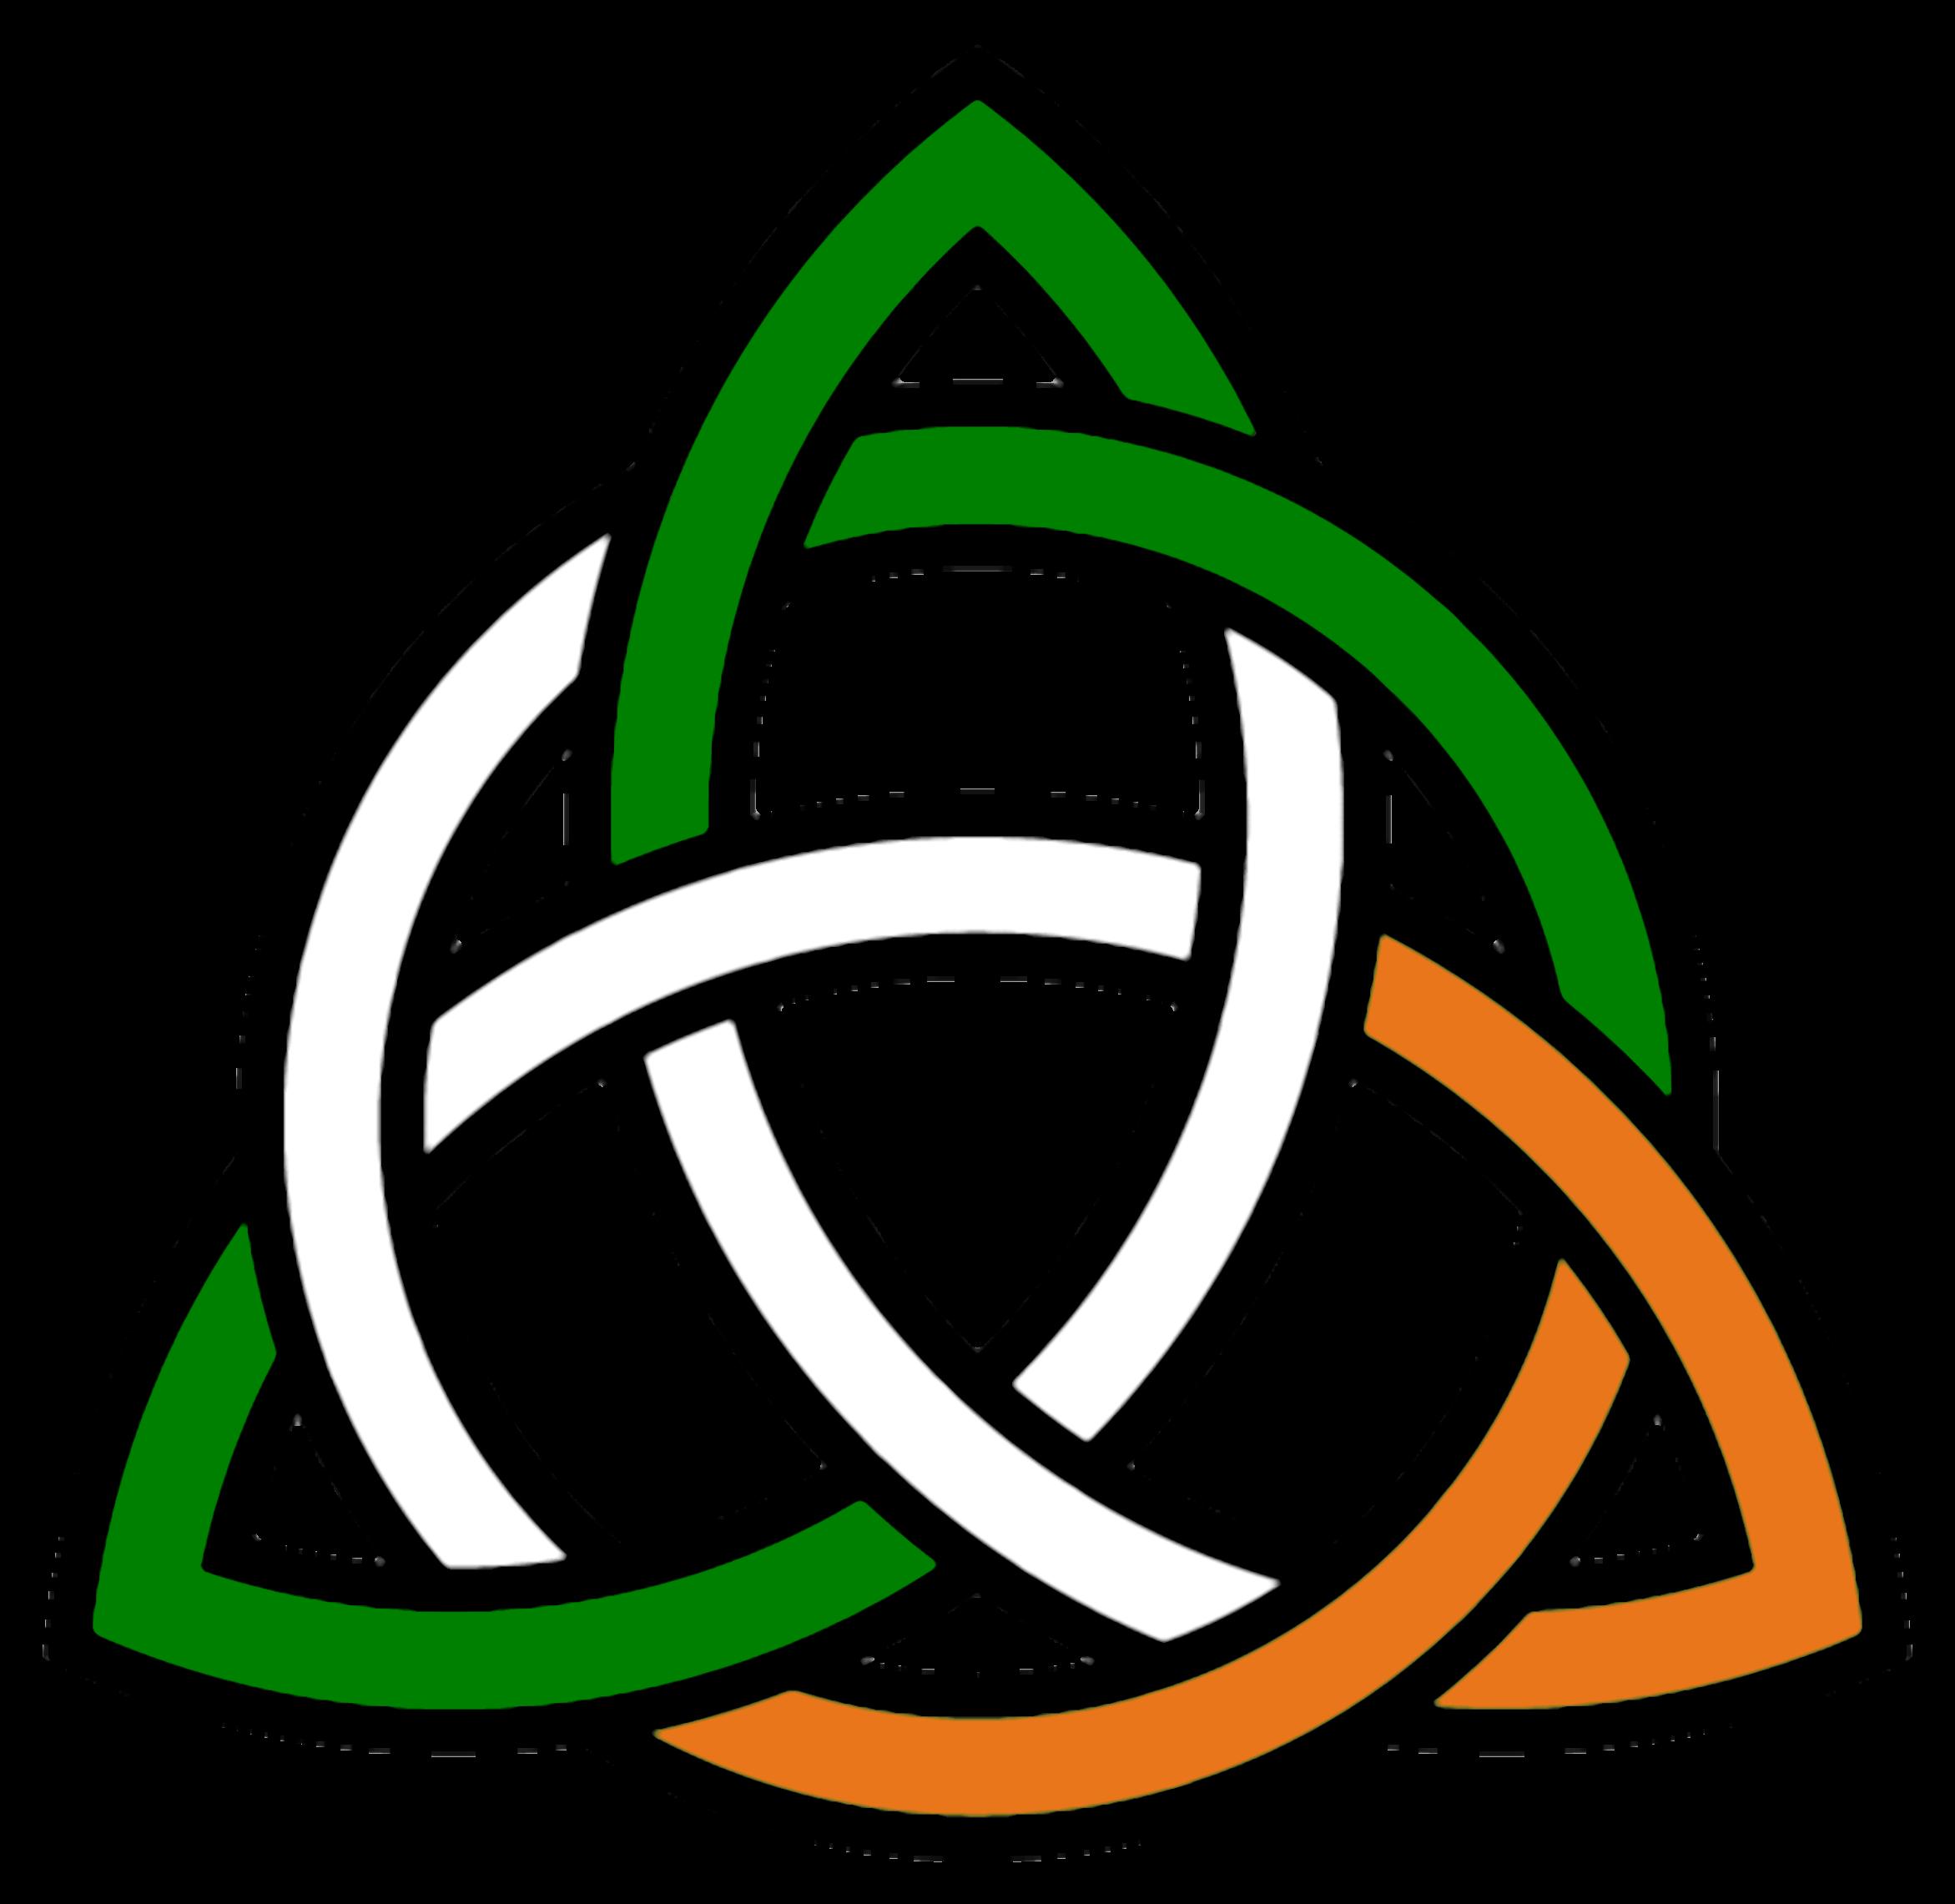 Trinity group symbols. Clover clipart glitter